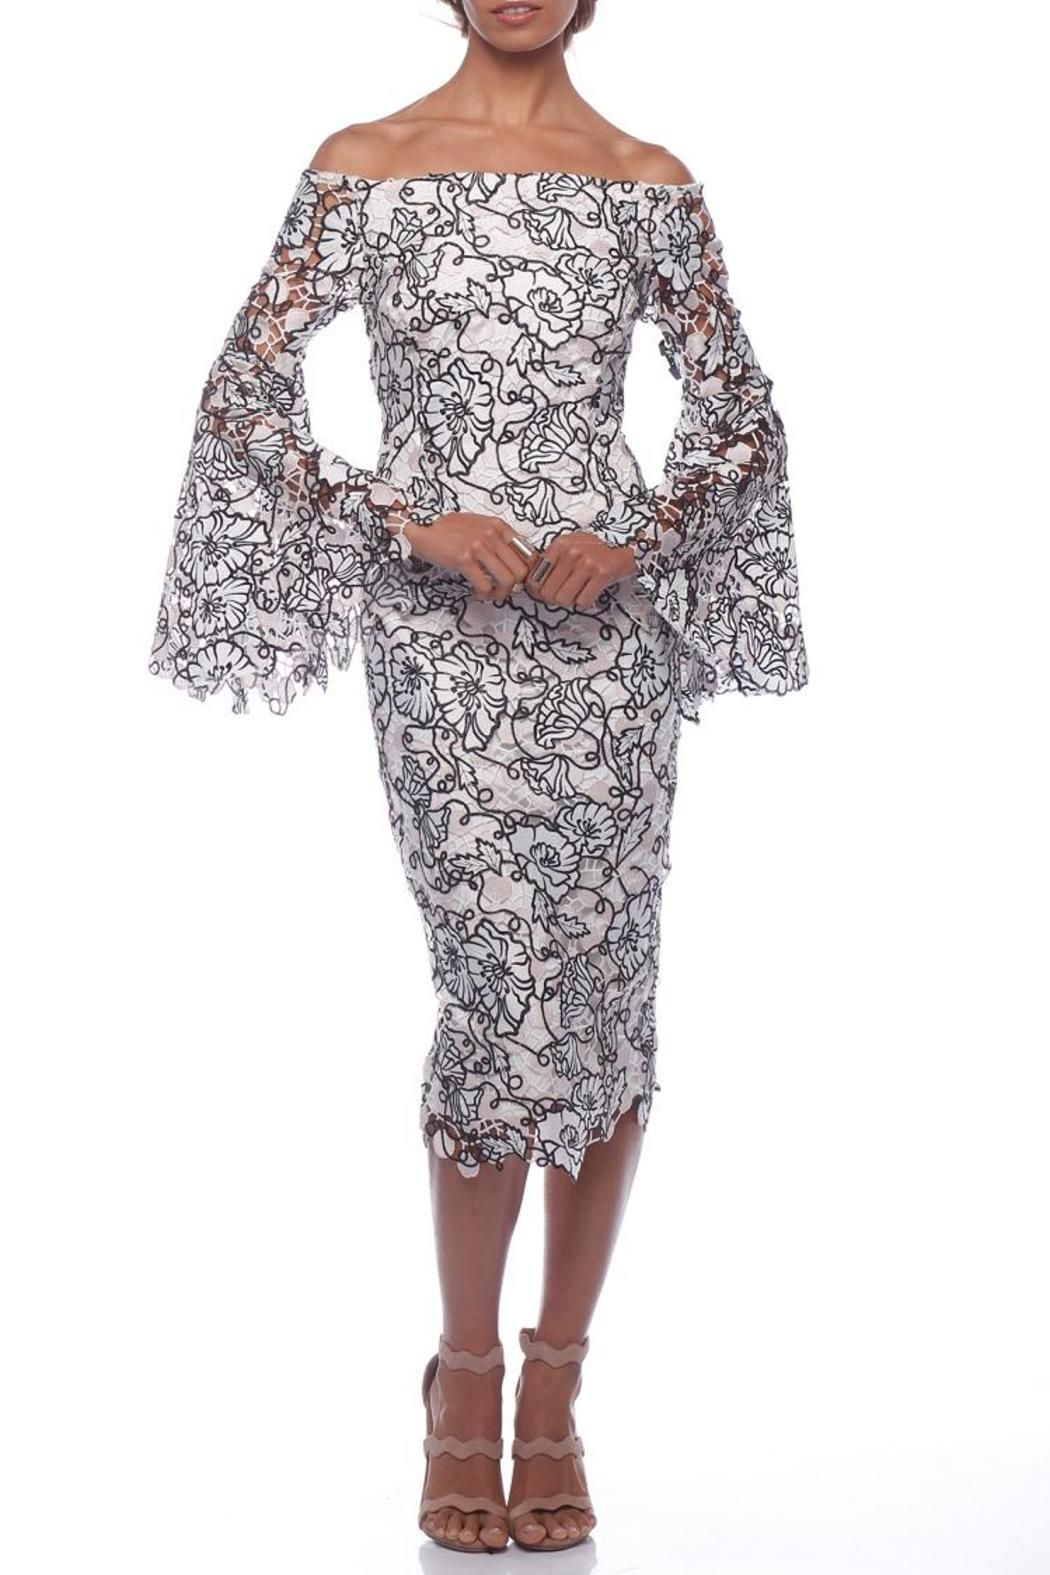 Pasduchas Ivy Grove Midi Dress | Boutique Highlights